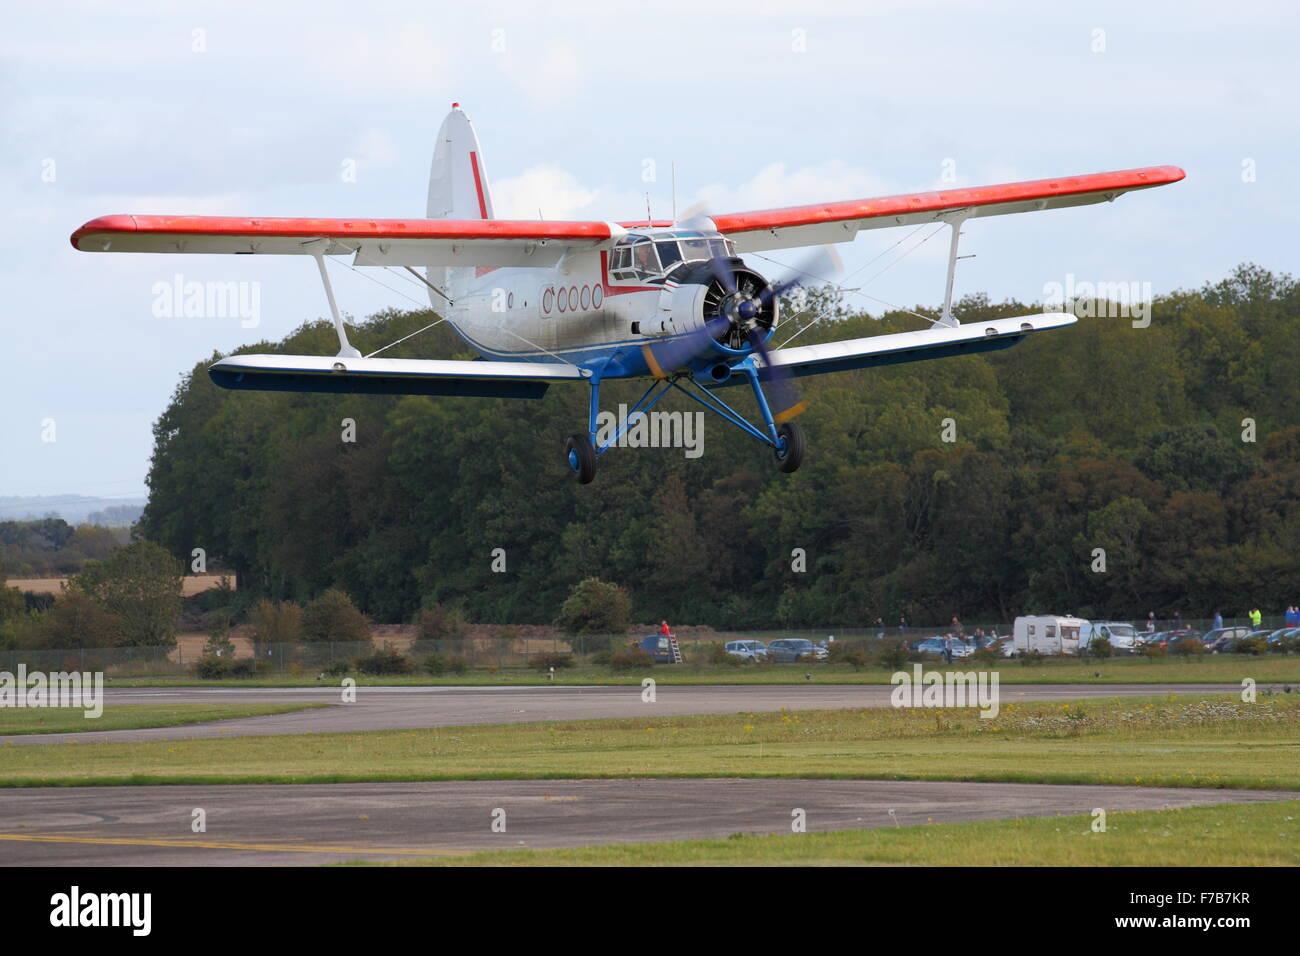 Antonov An-2 landing at Abingdon Airfield - Stock Image